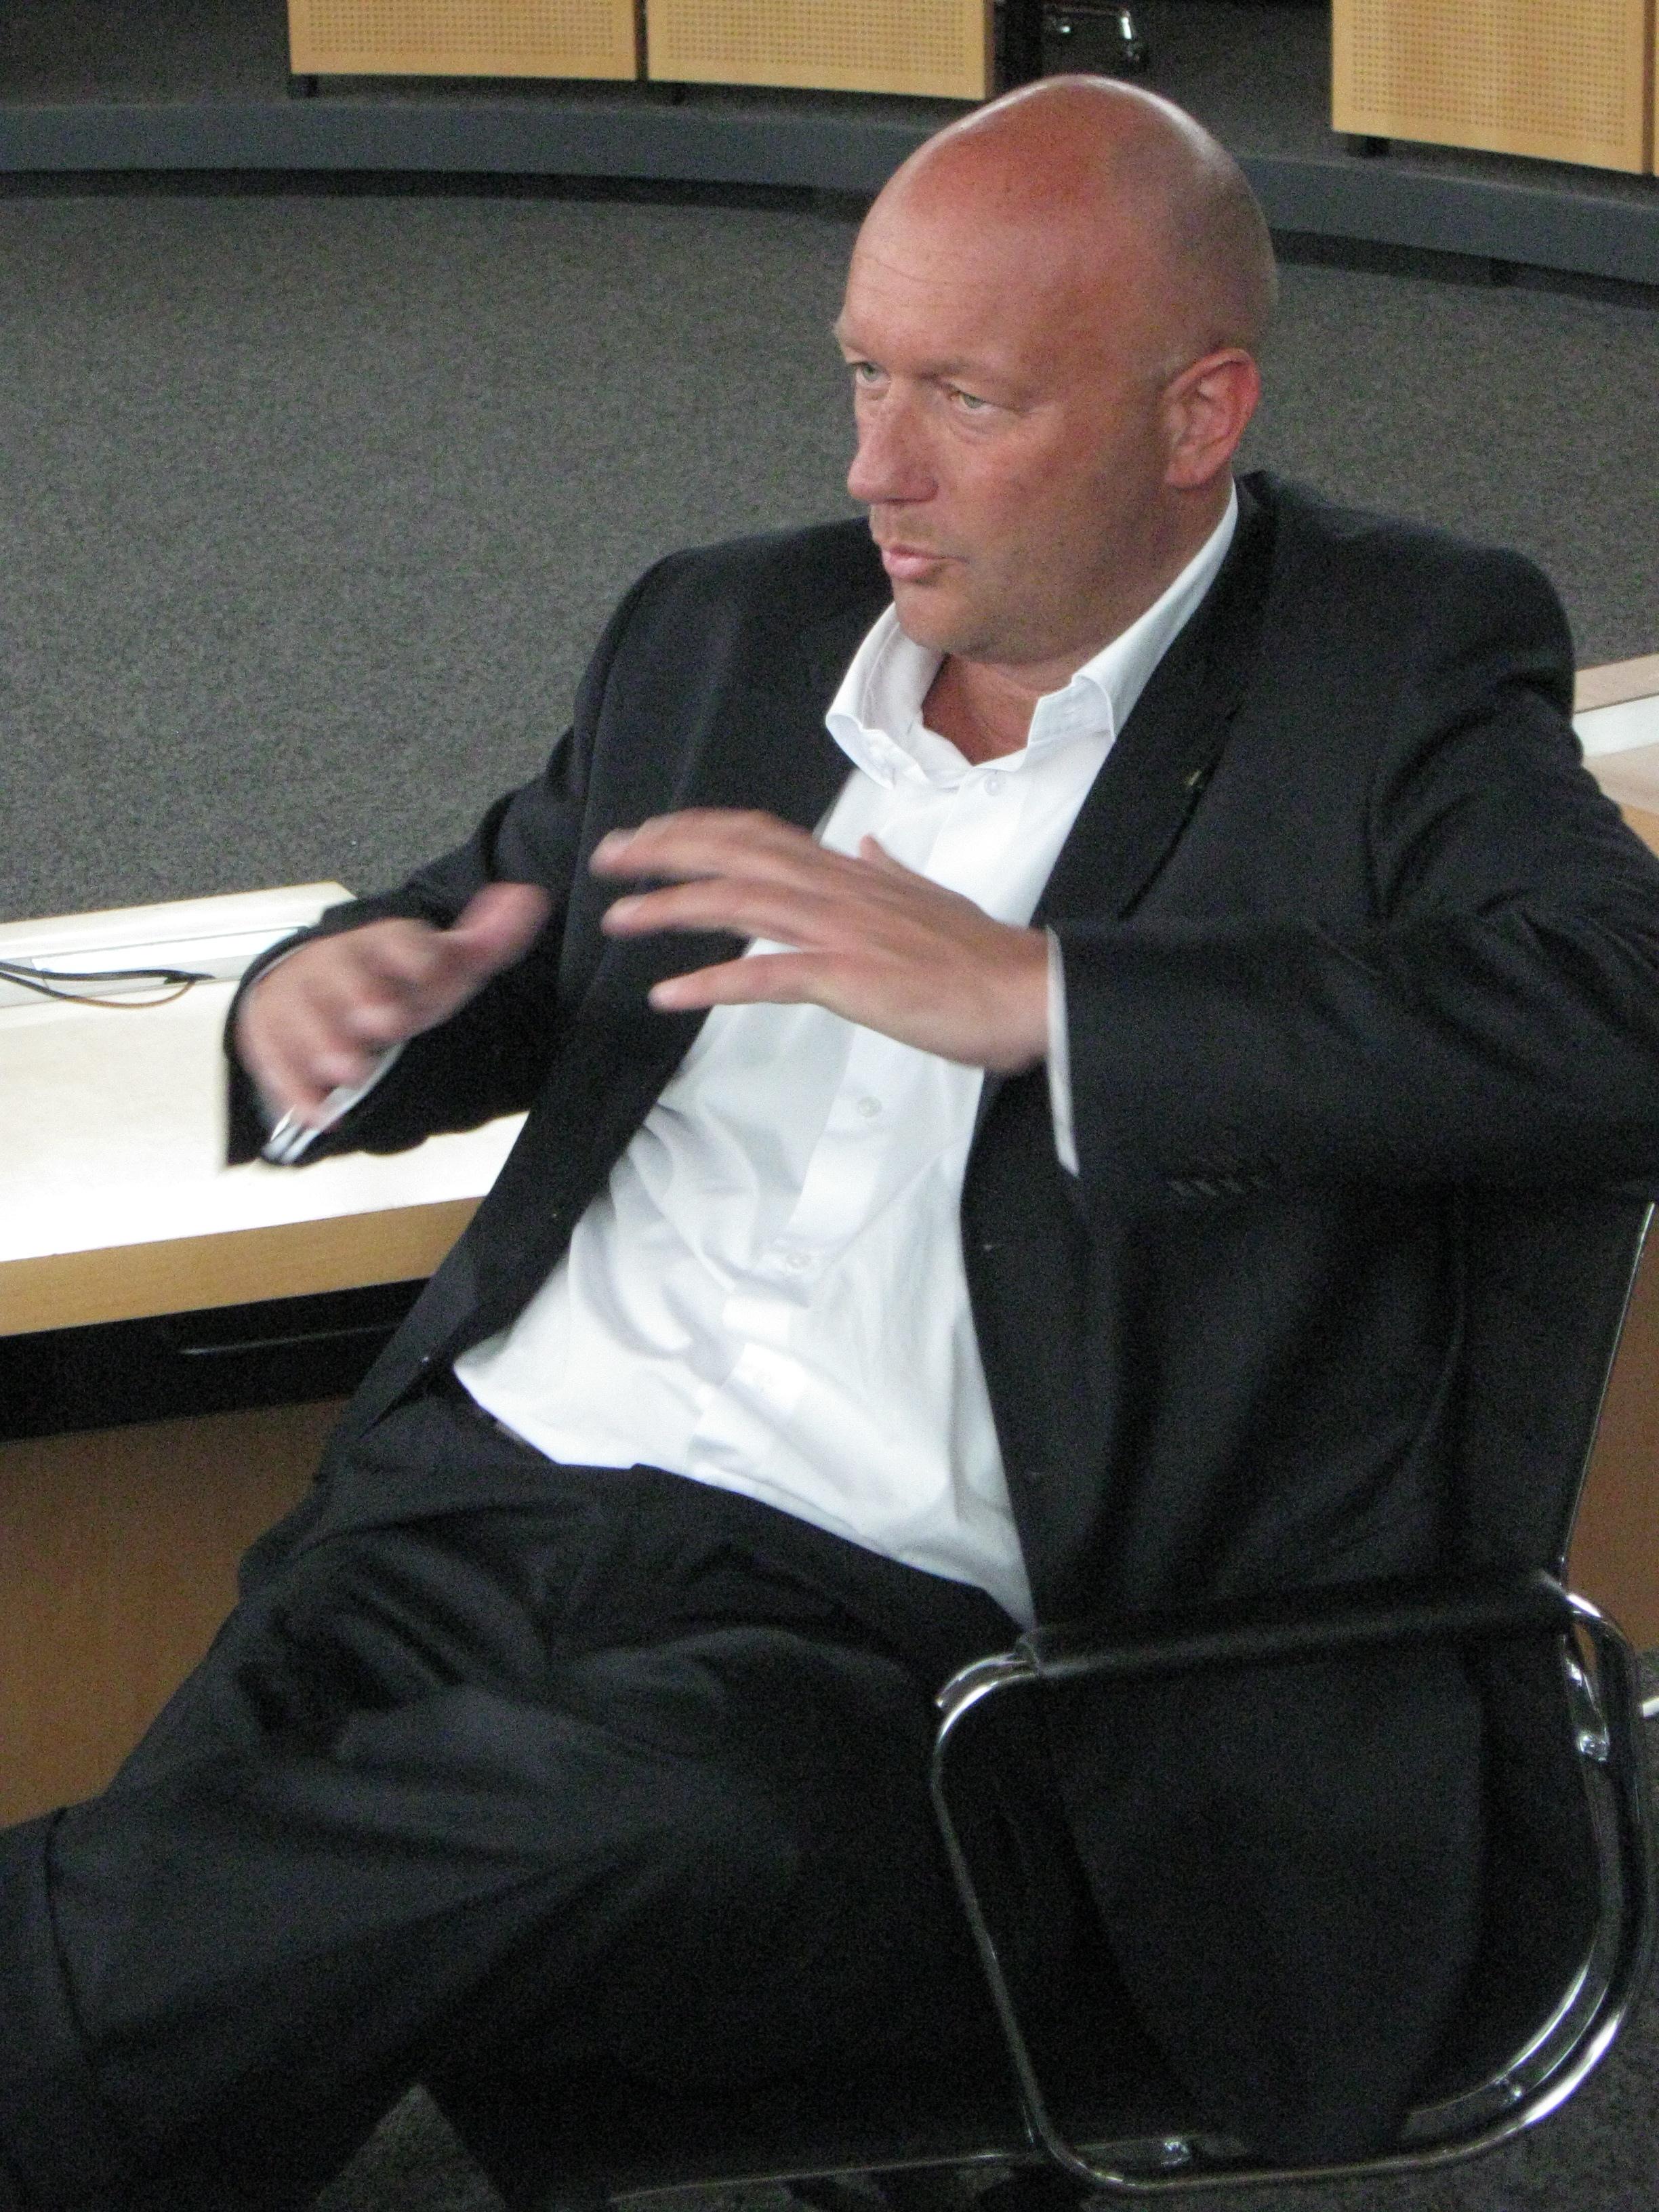 MdL Thomas L. Kemmerich